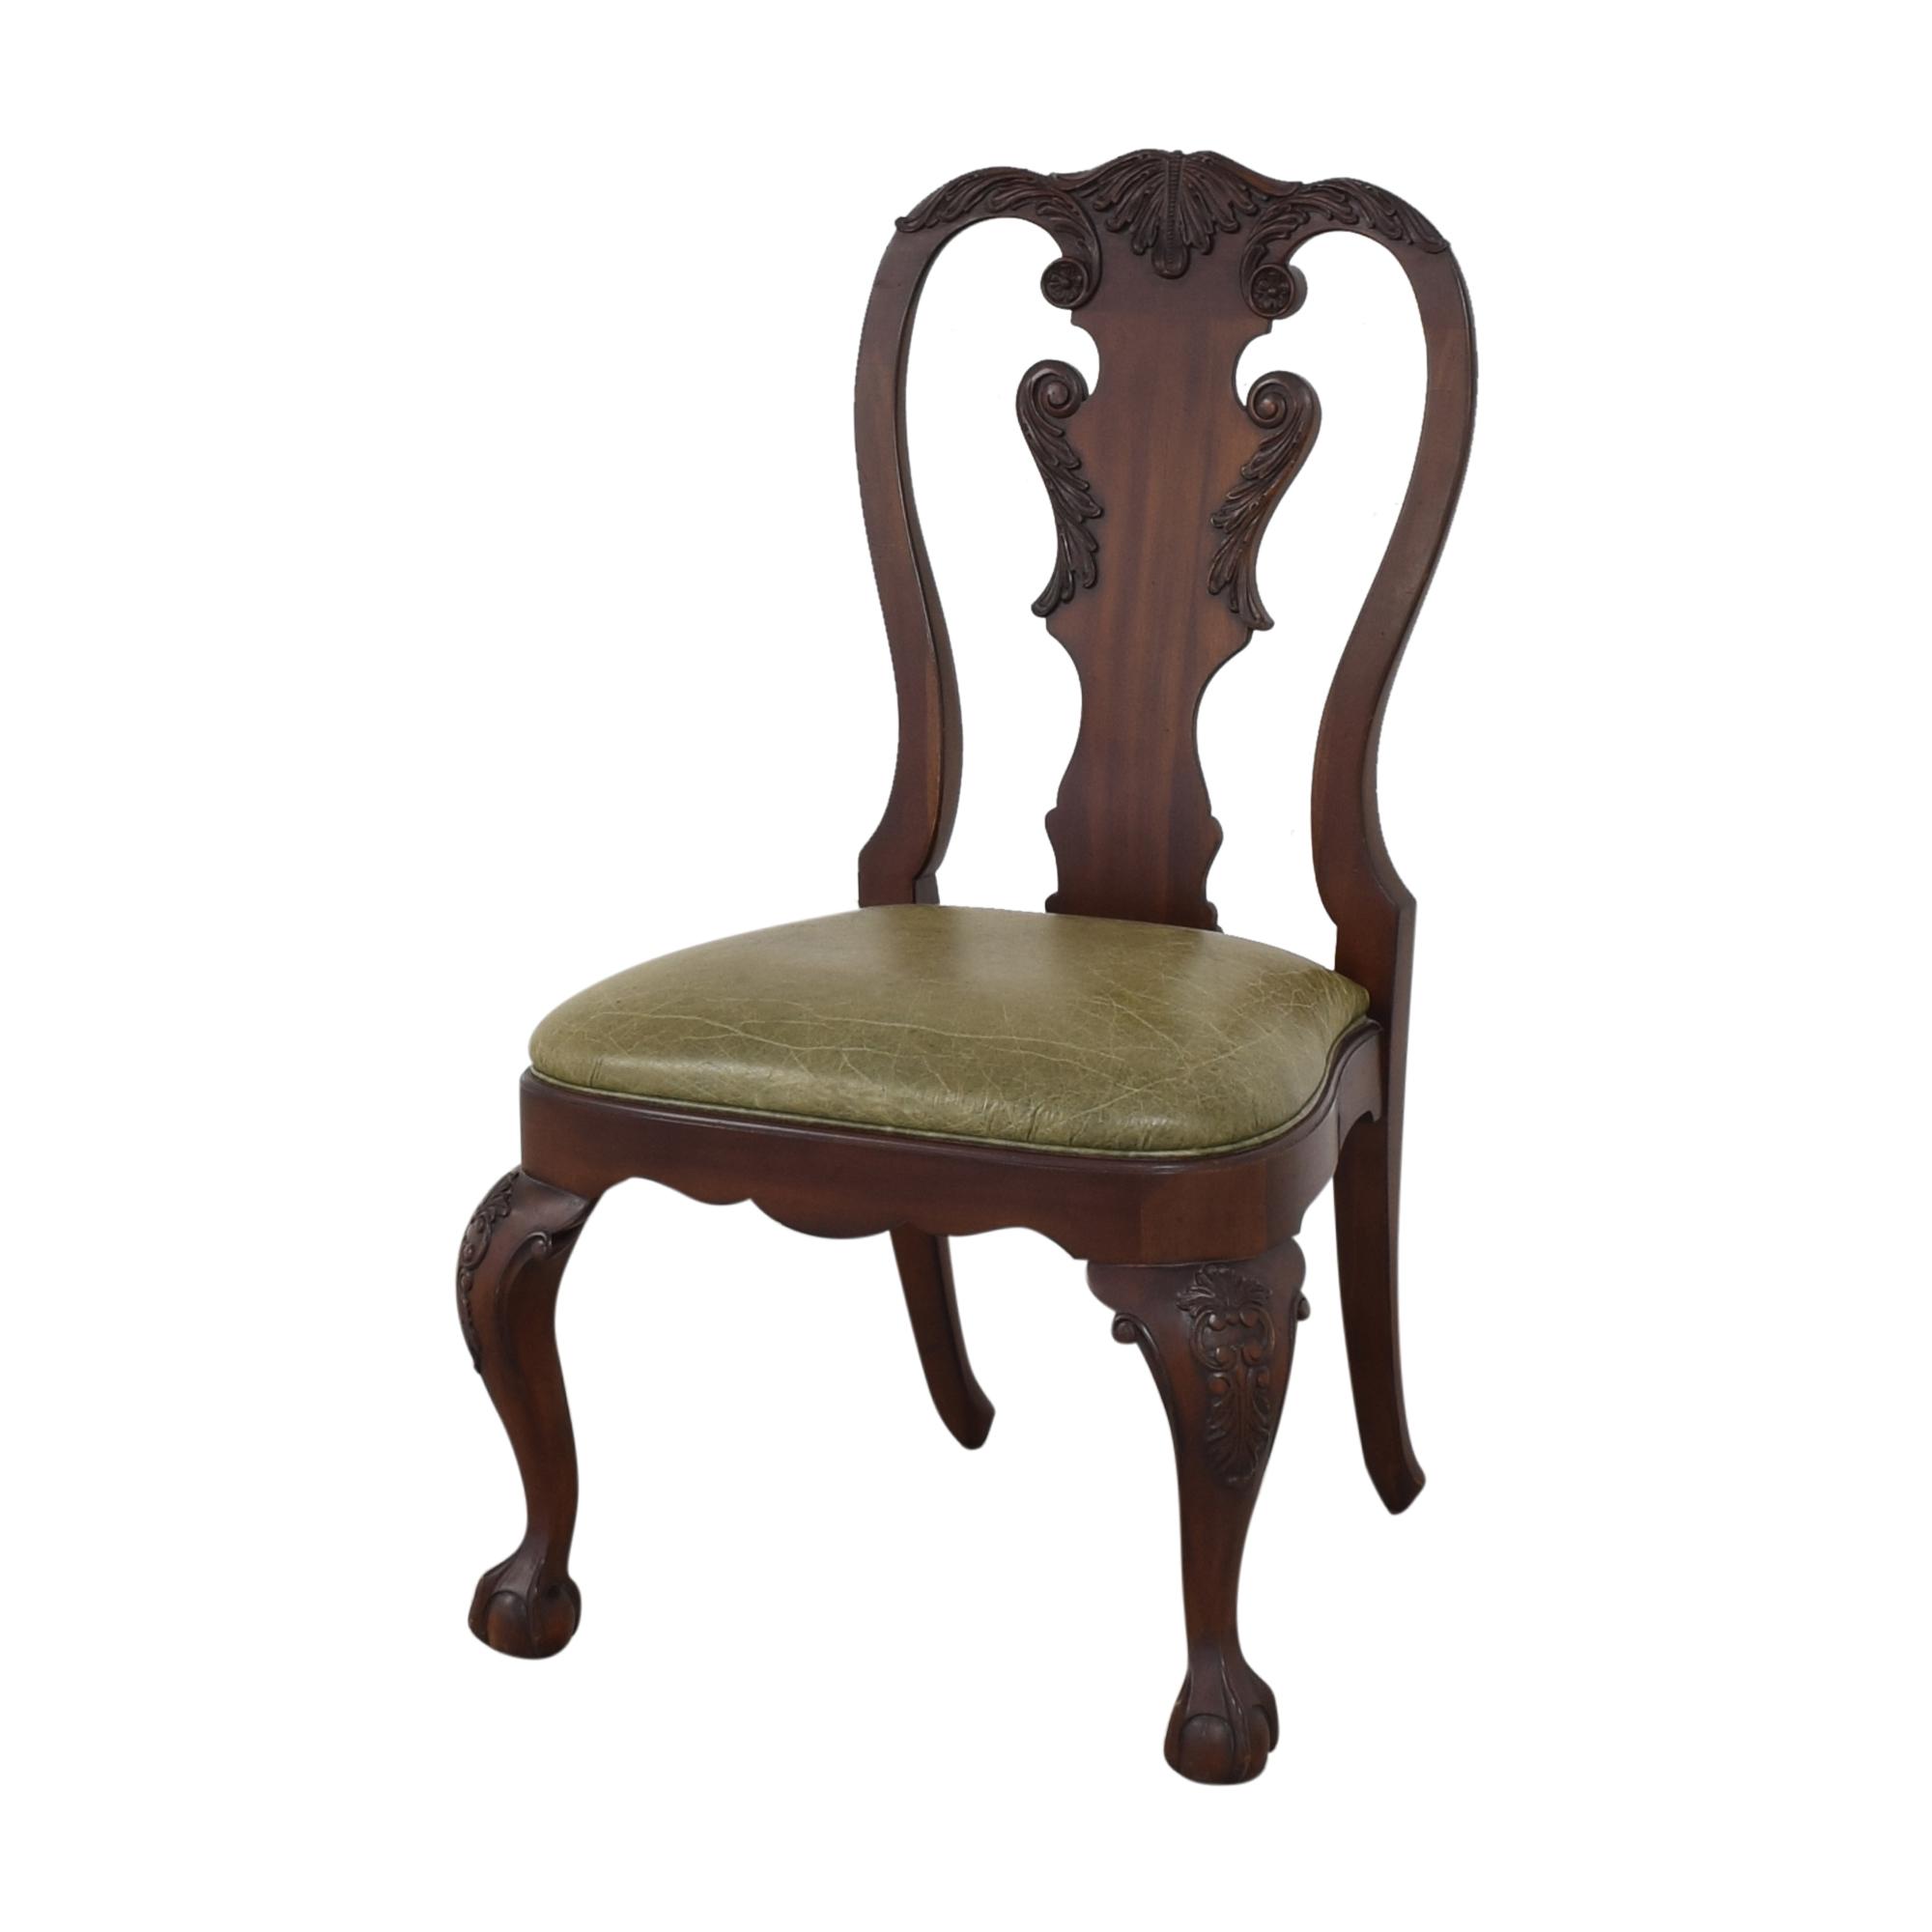 Ethan Allen Ethan Allen Queen Anne Side Dining Chairs price